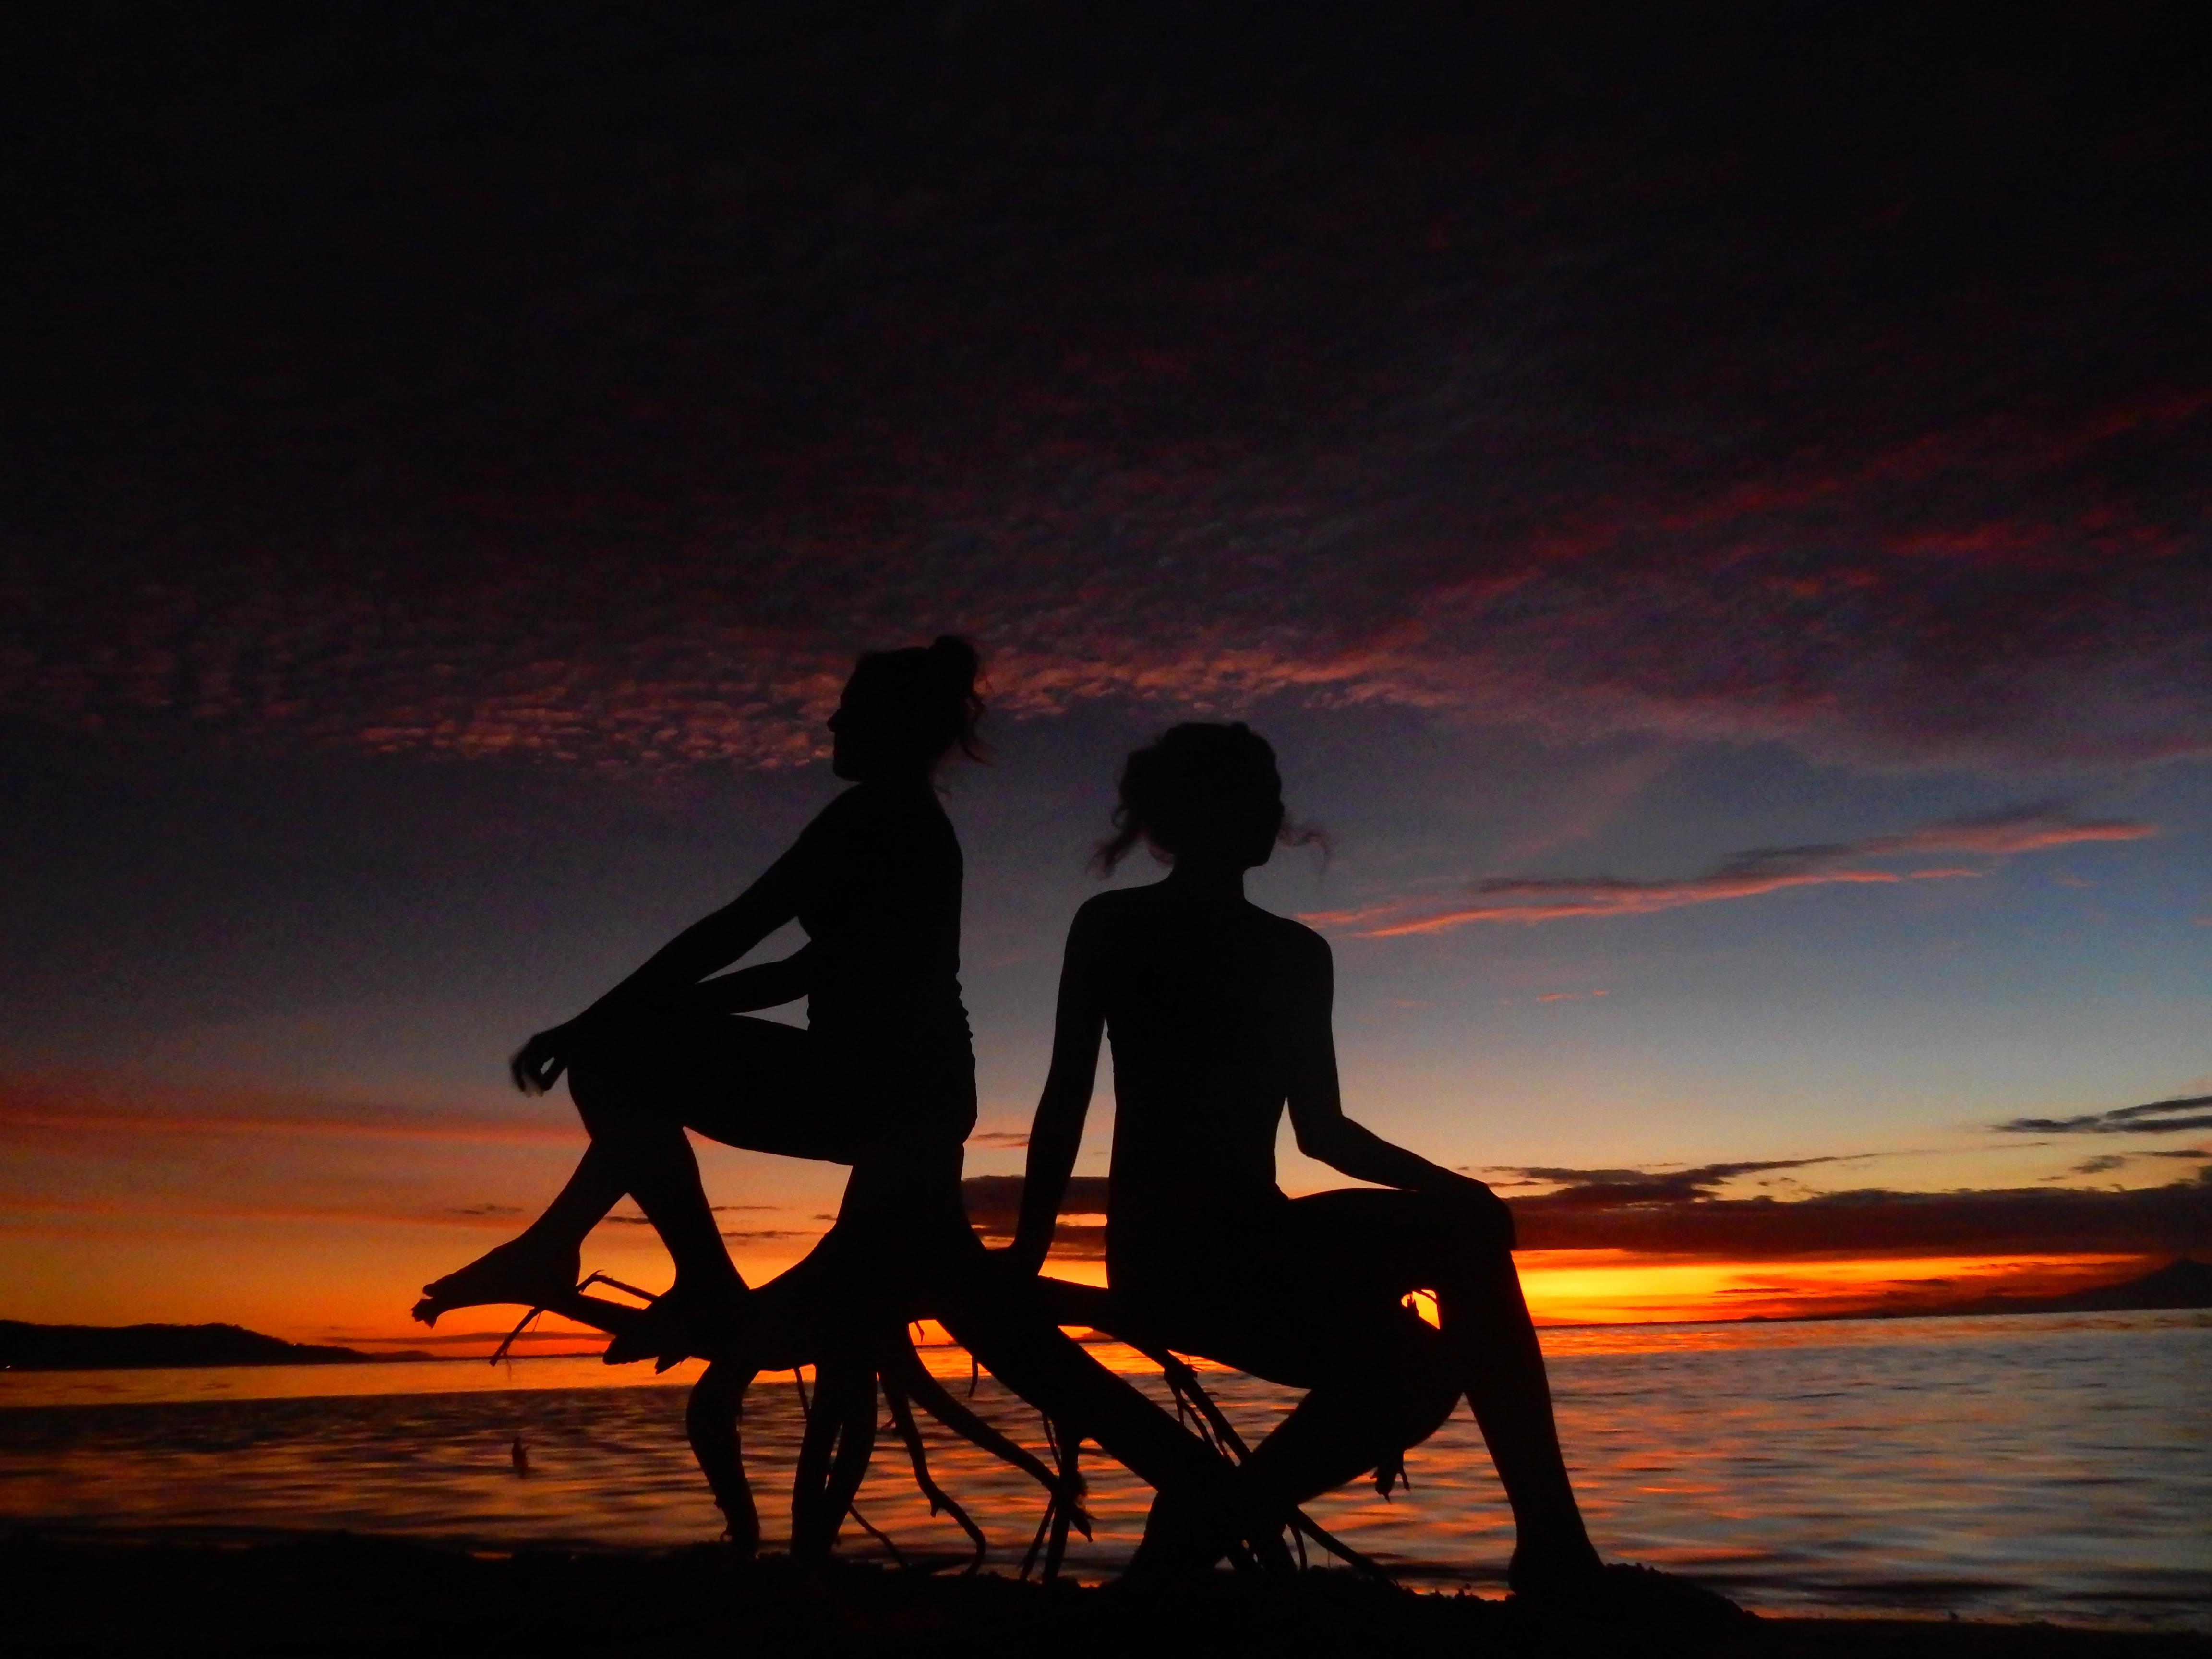 Coucher de soleil, Sunset, Gili Air, Indonésie